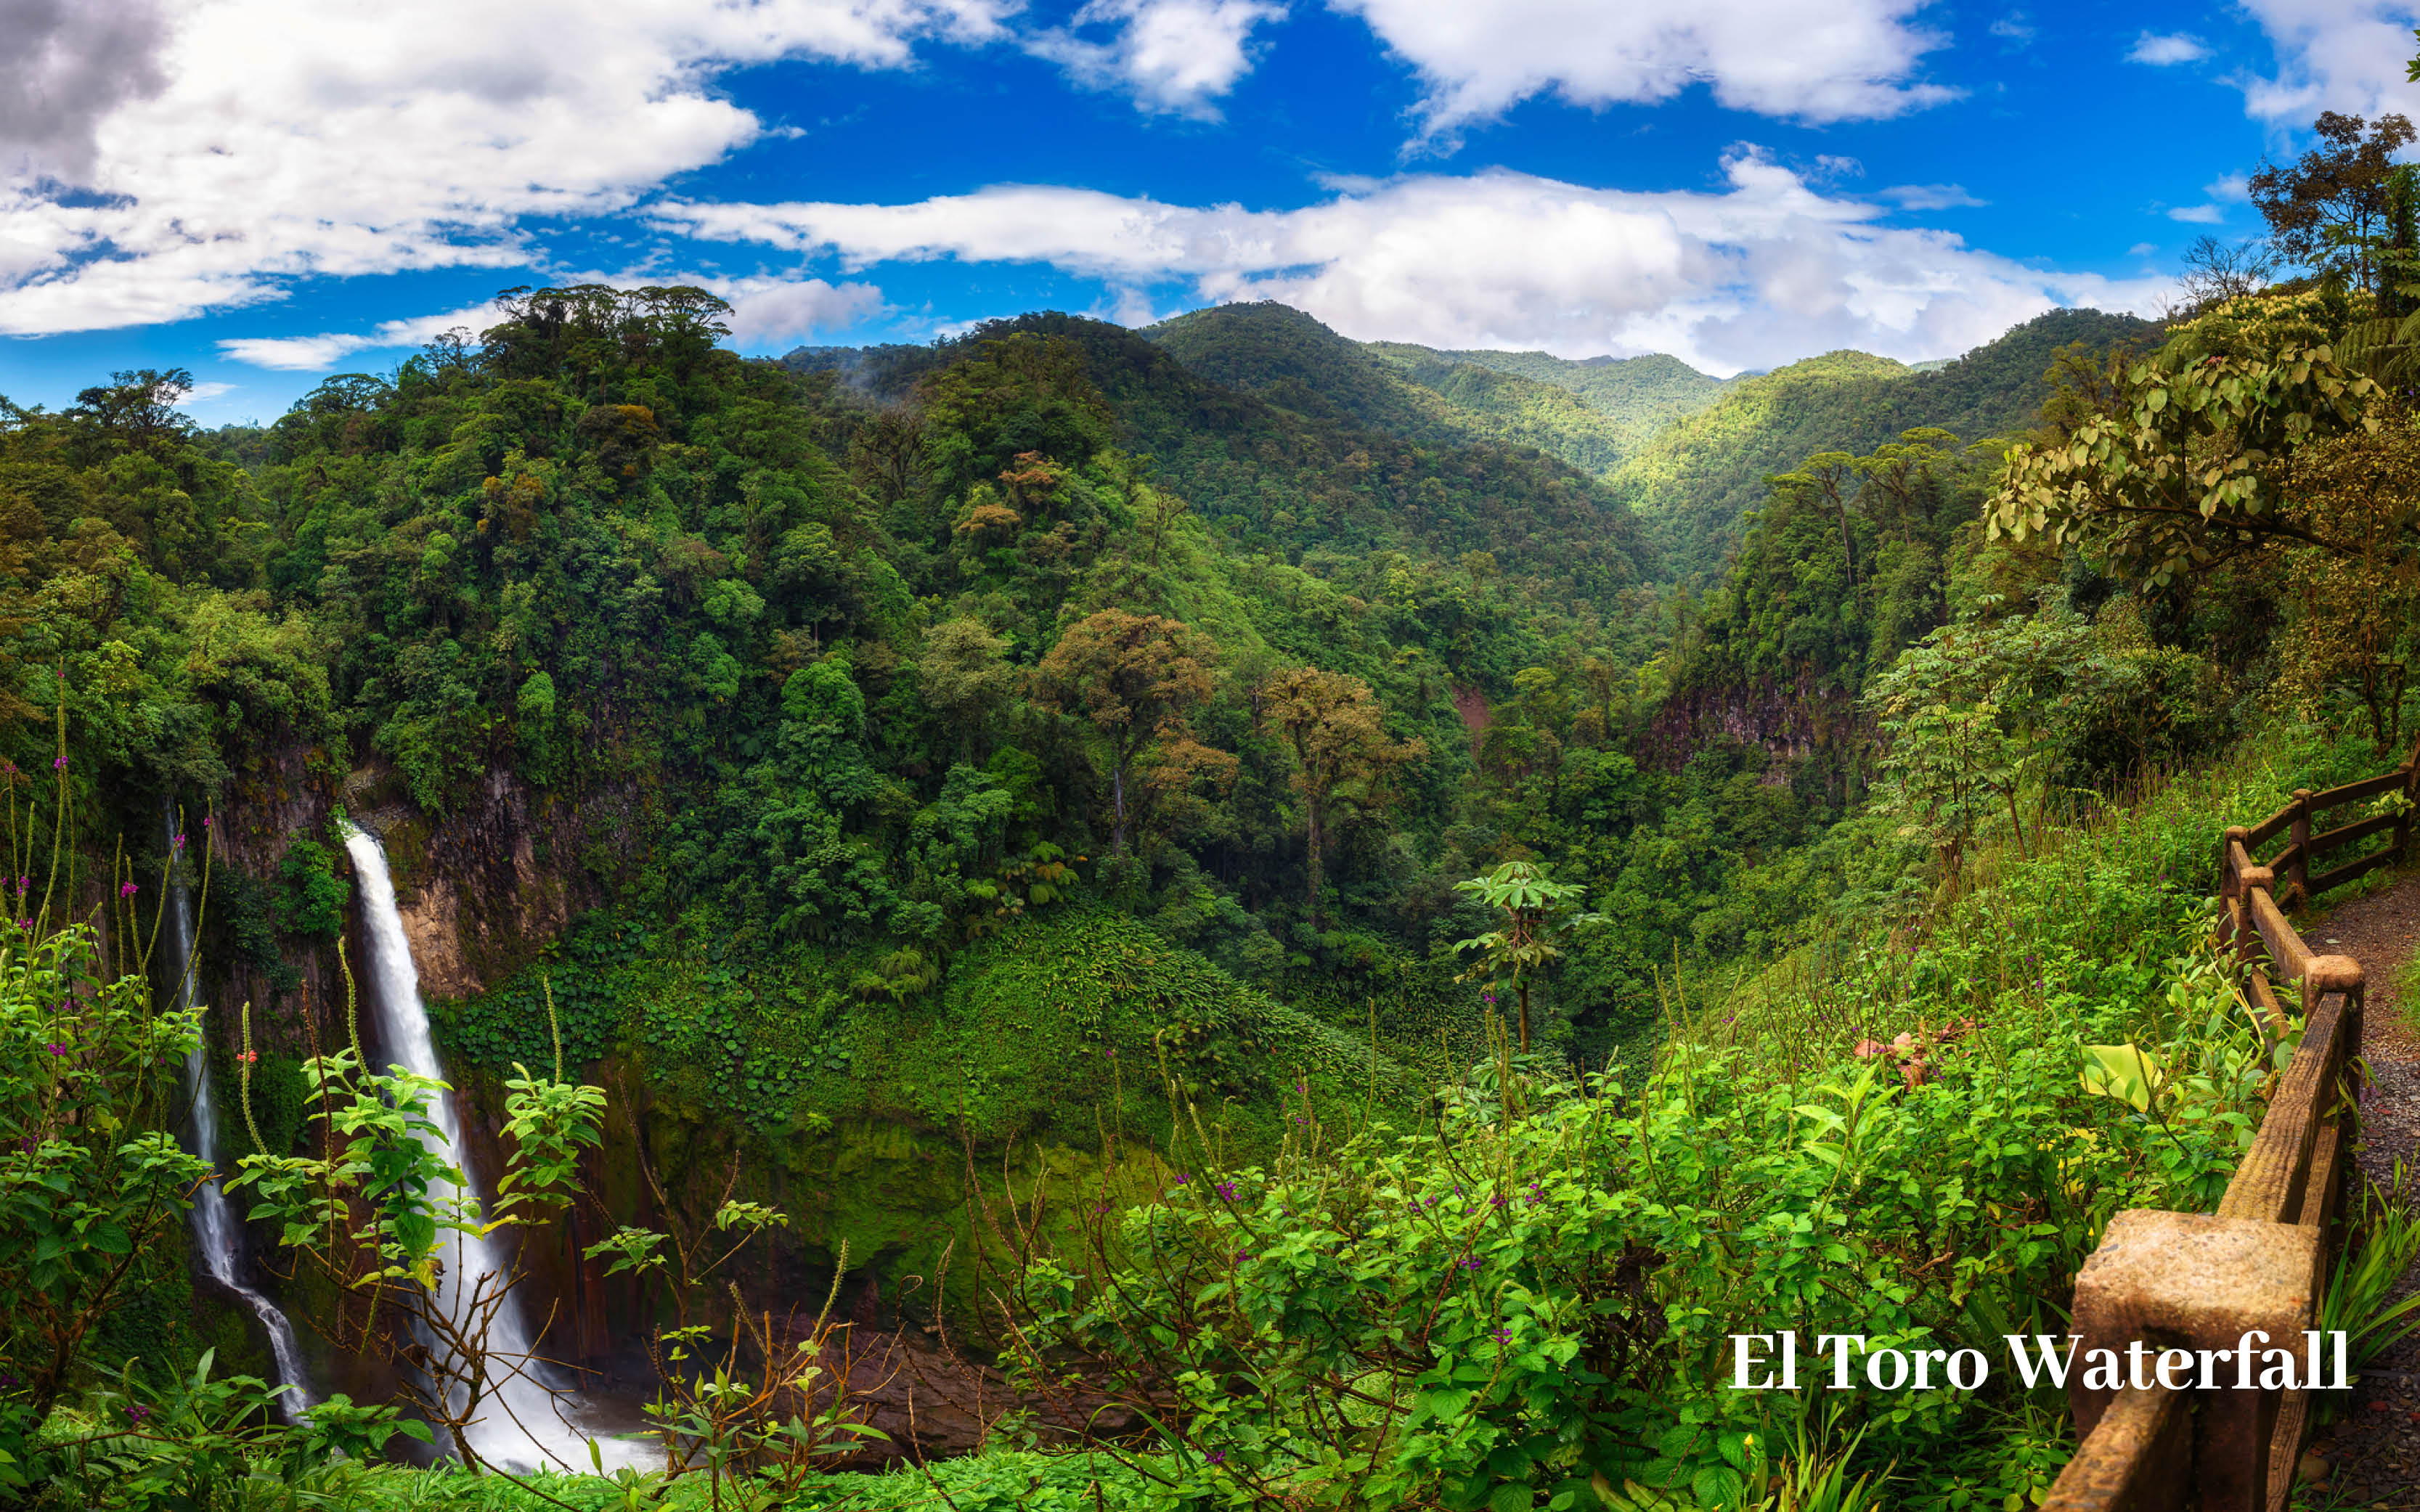 El toro waterfall costa rica holiday offer